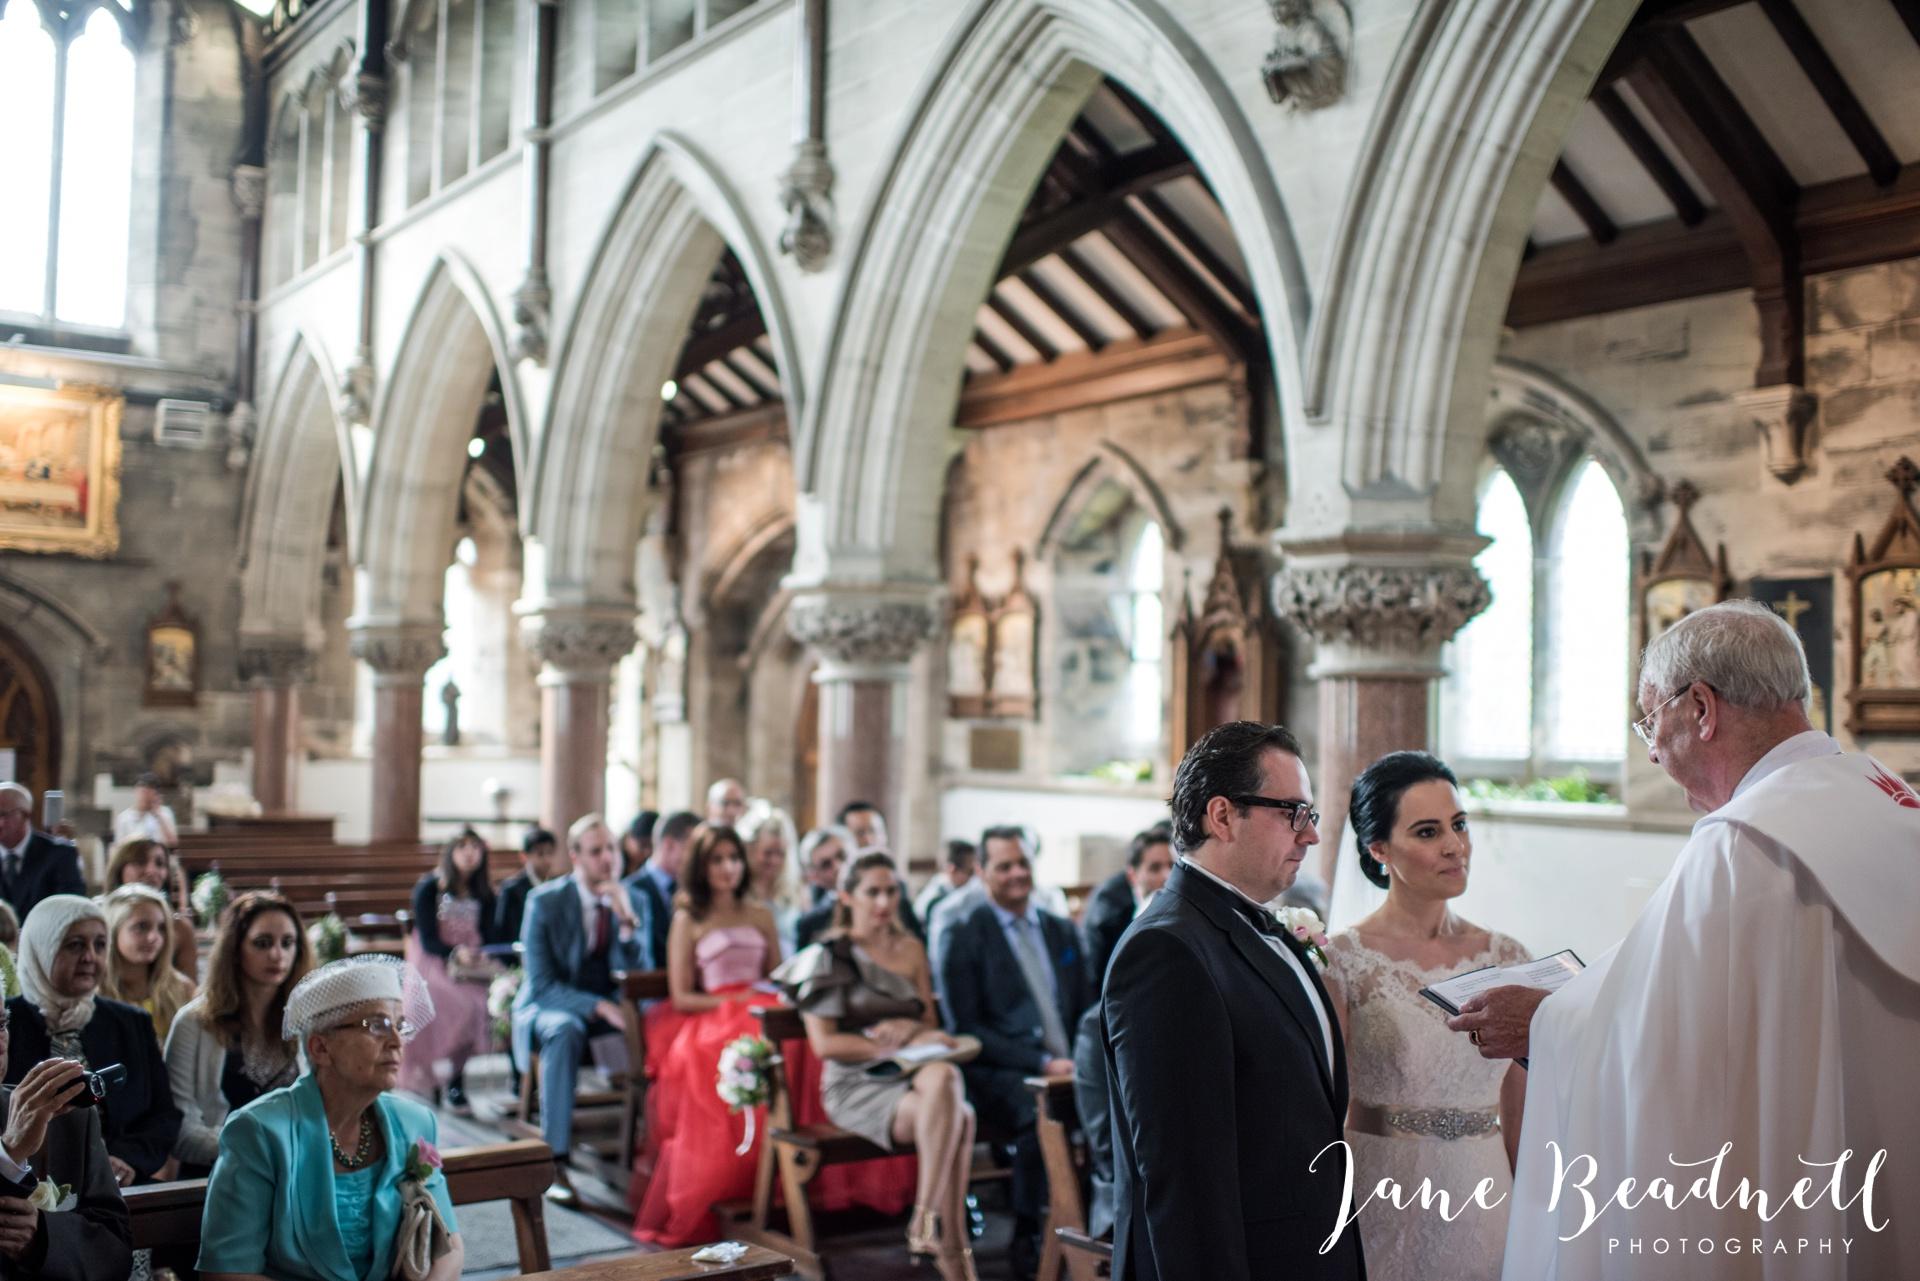 Jane Beadnell fine art wedding photographer Rudding Park Harrogate_0032